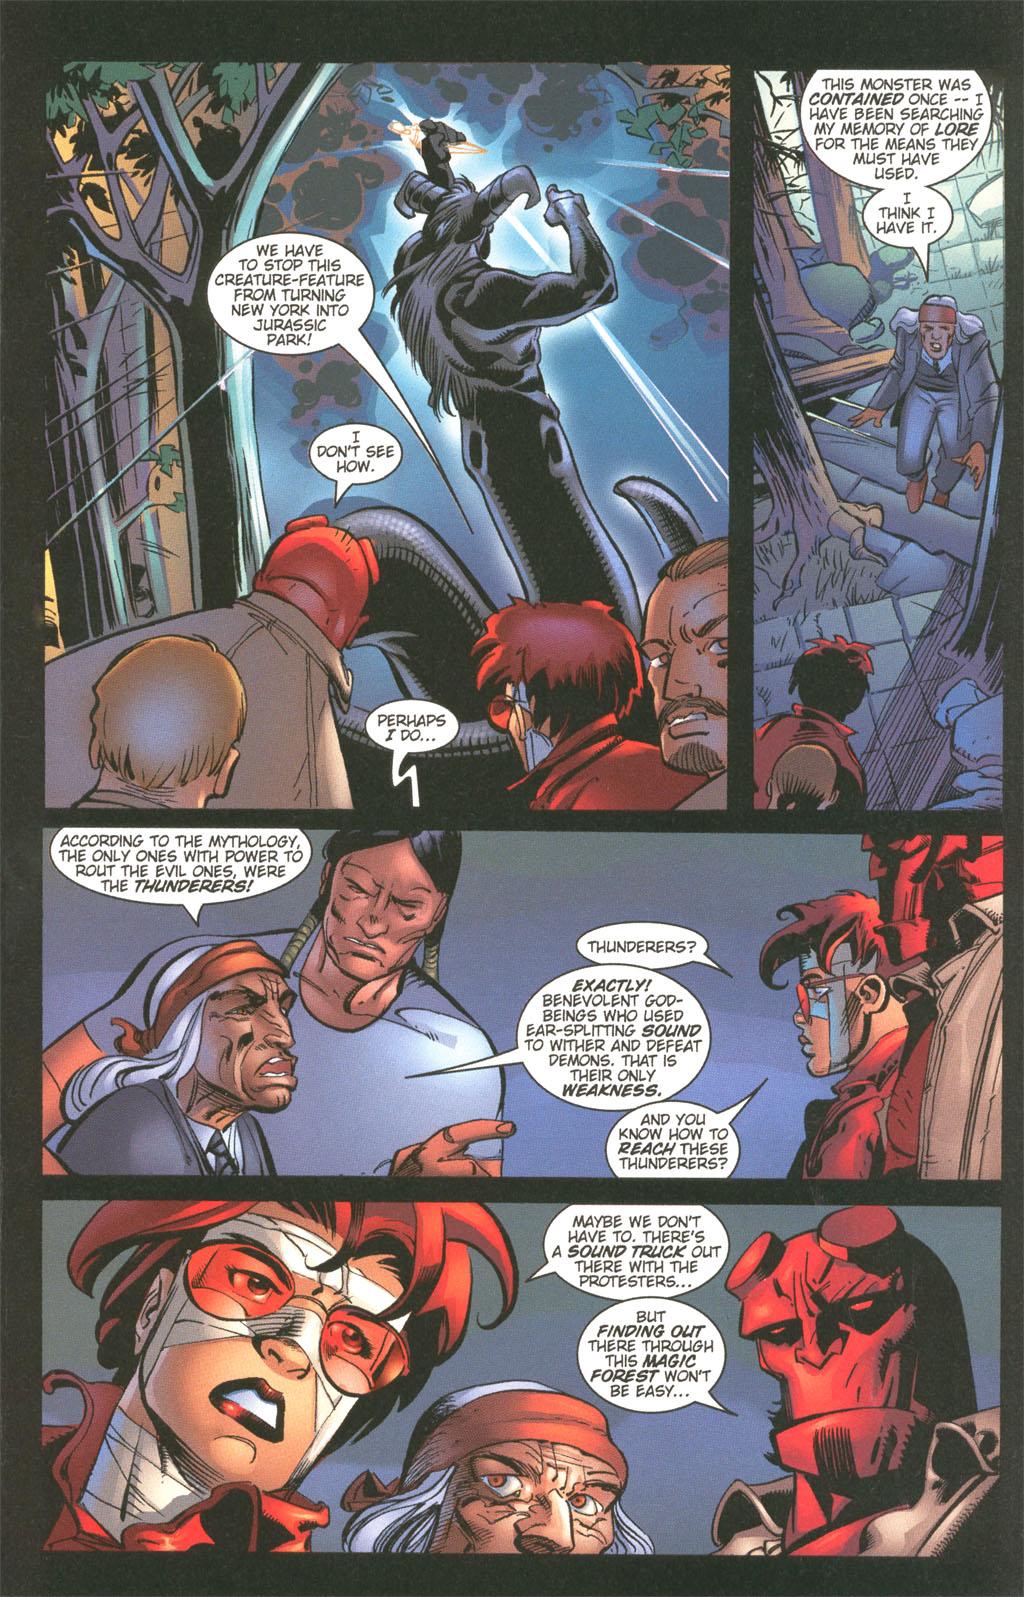 Read online Painkiller Jane/Hellboy comic -  Issue # Full - 17